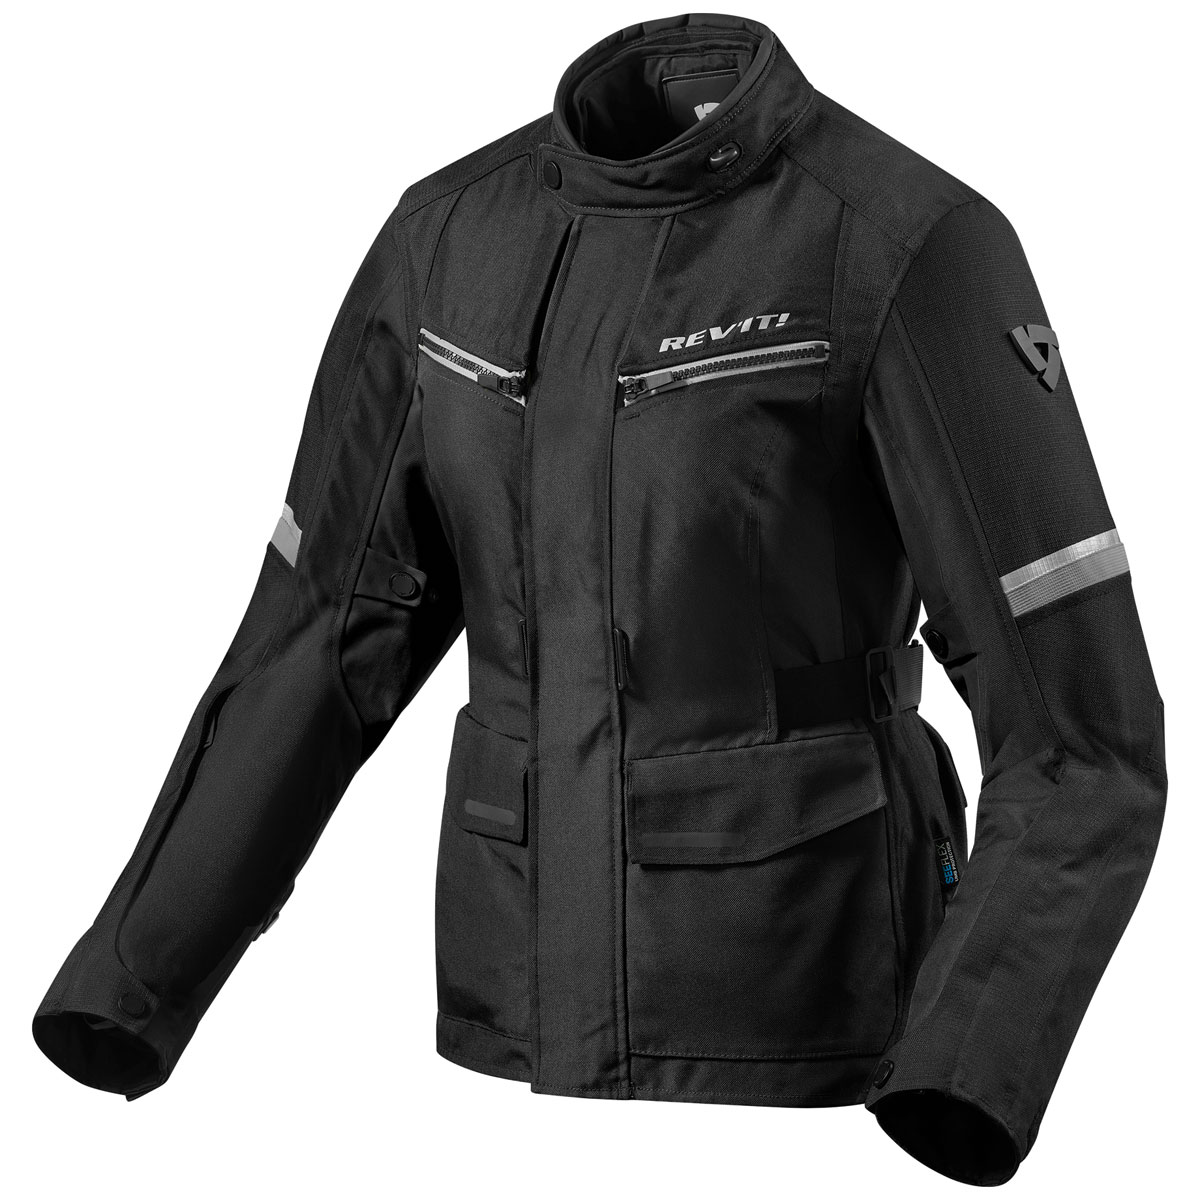 REV′IT! Women's Outback 3 Black/Silver Textile Jacket